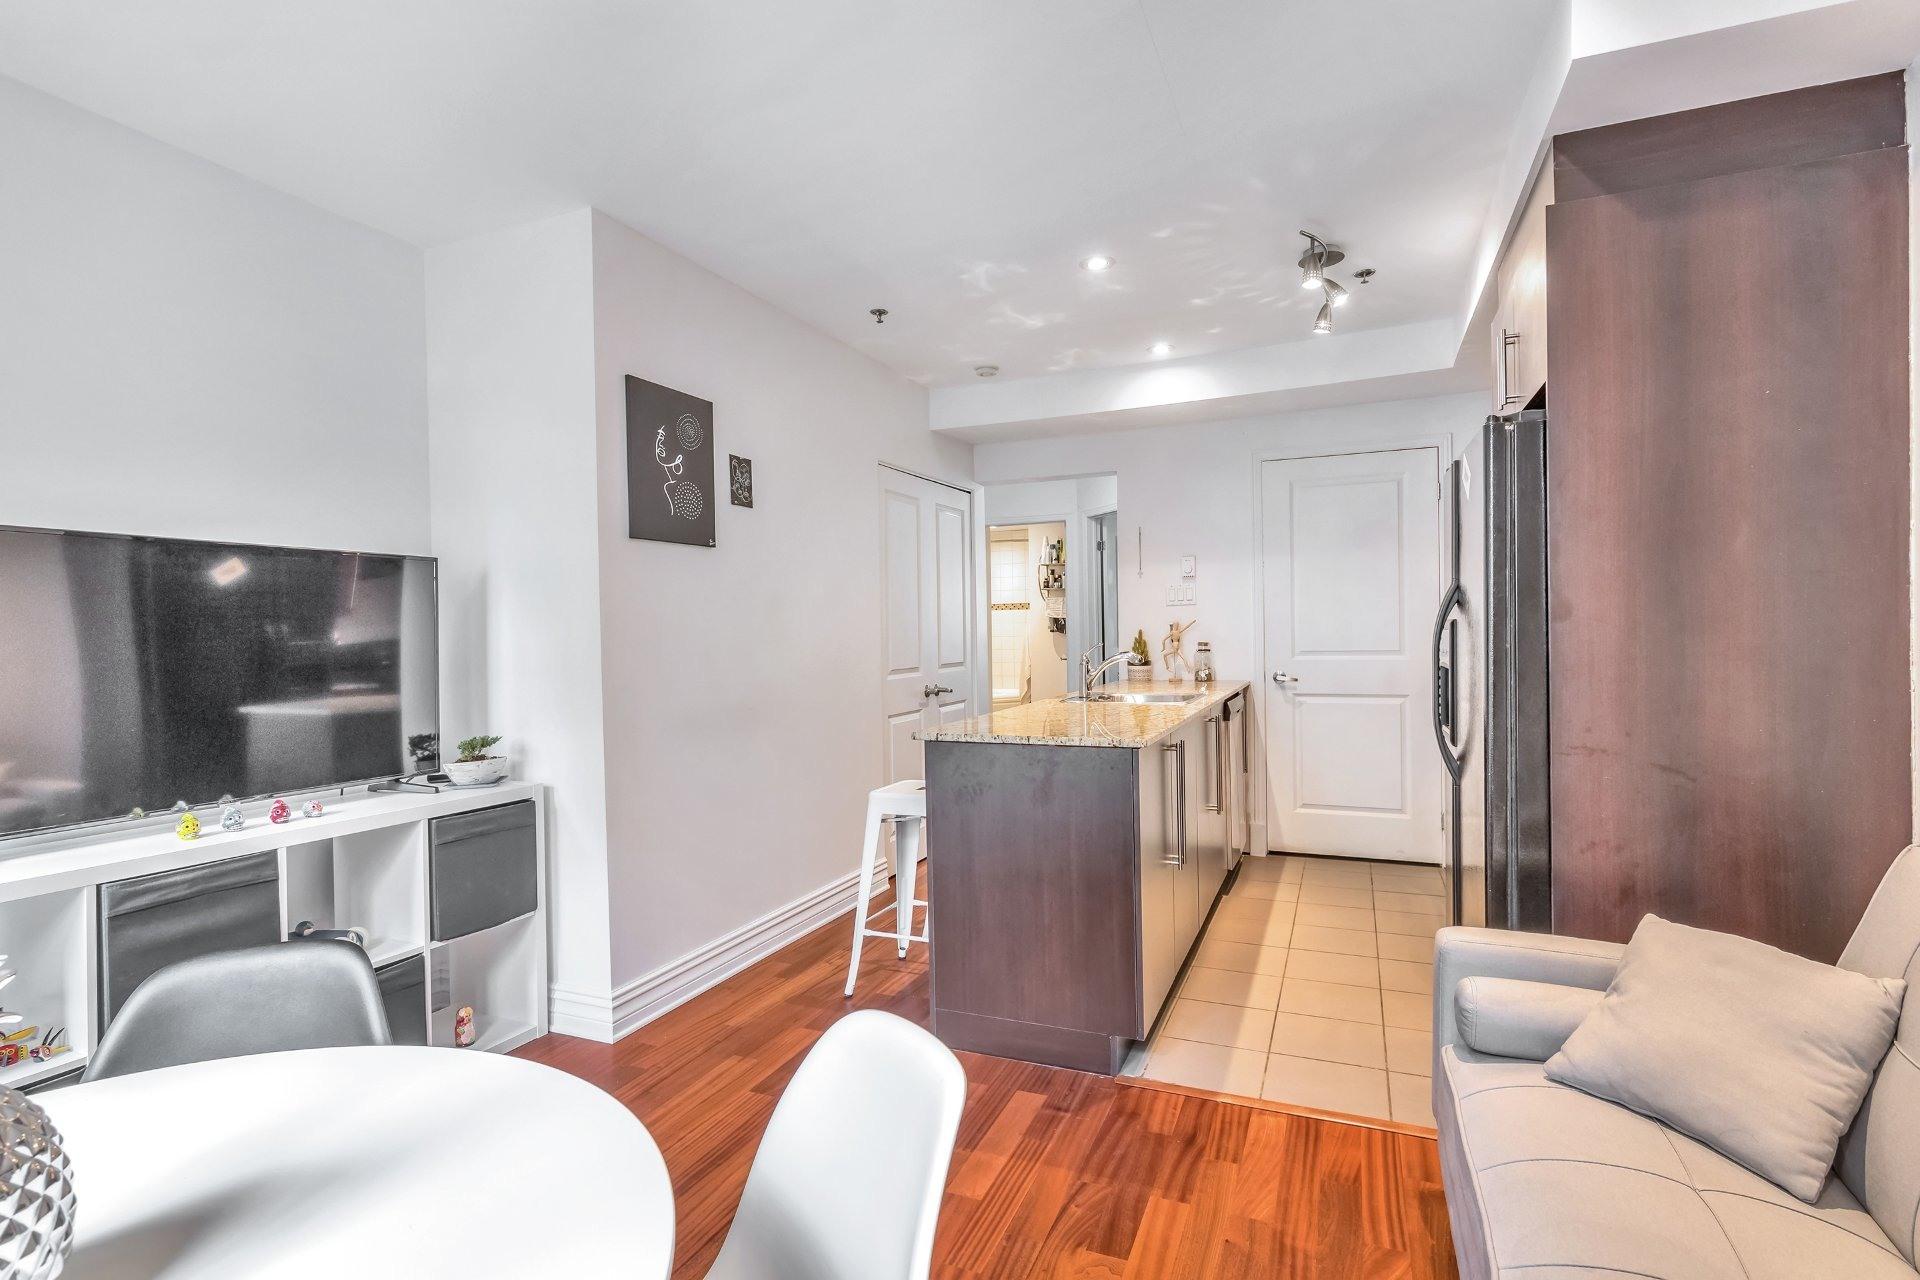 image 4 - Departamento En venta Le Plateau-Mont-Royal Montréal  - 3 habitaciones